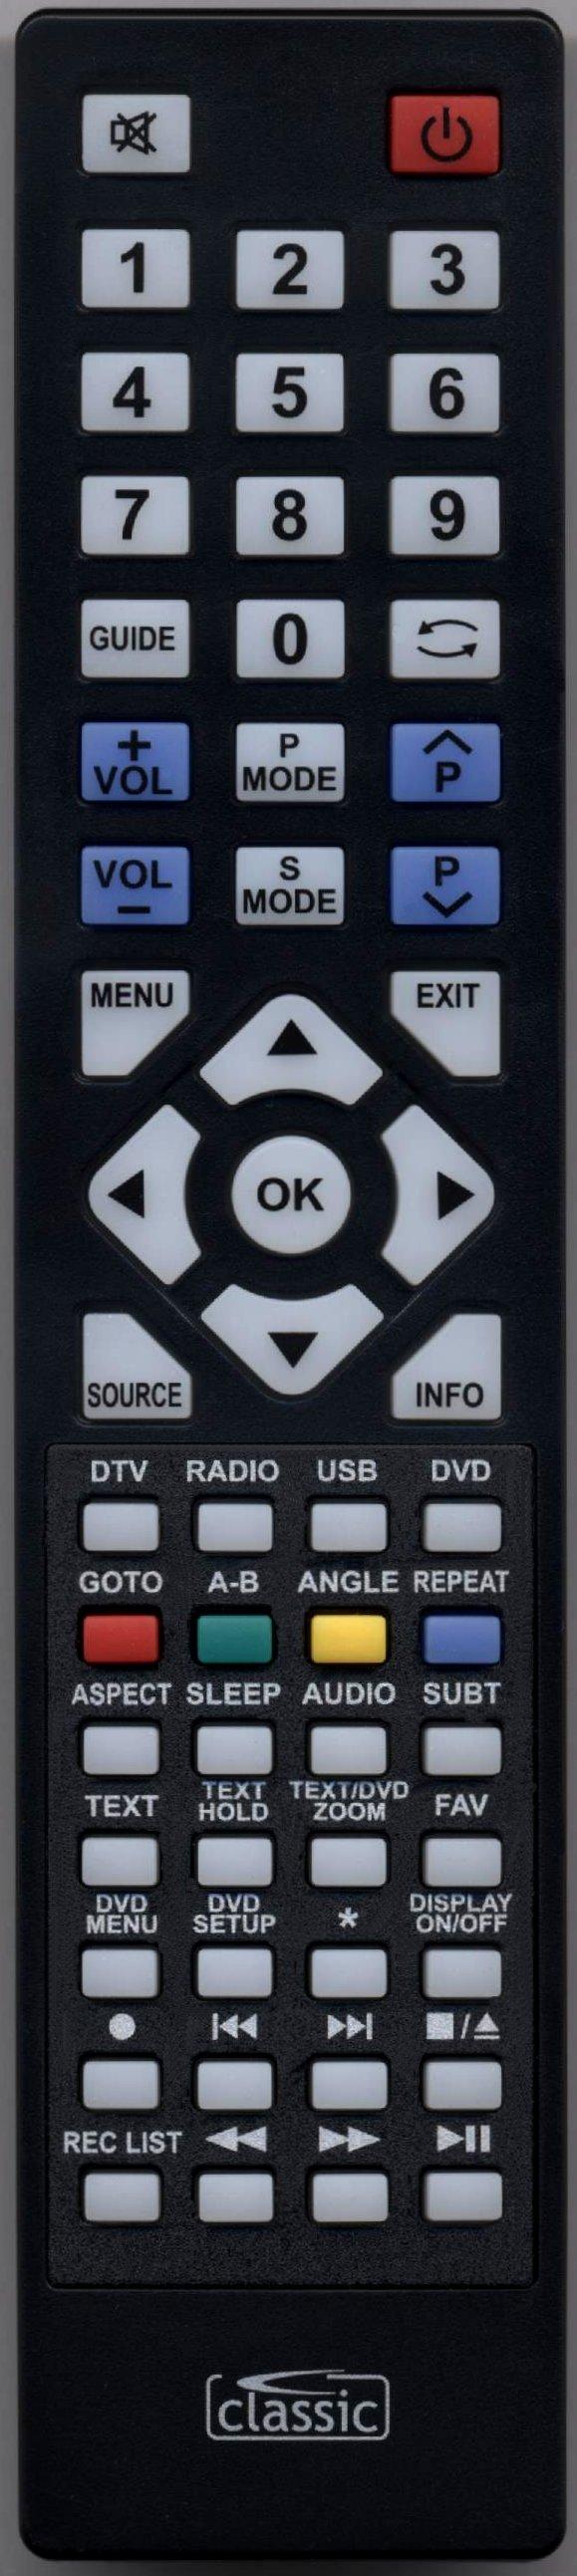 BLAUPUNKT 32/123J-GB-3B-HCDU-UK Remote Control Alternative